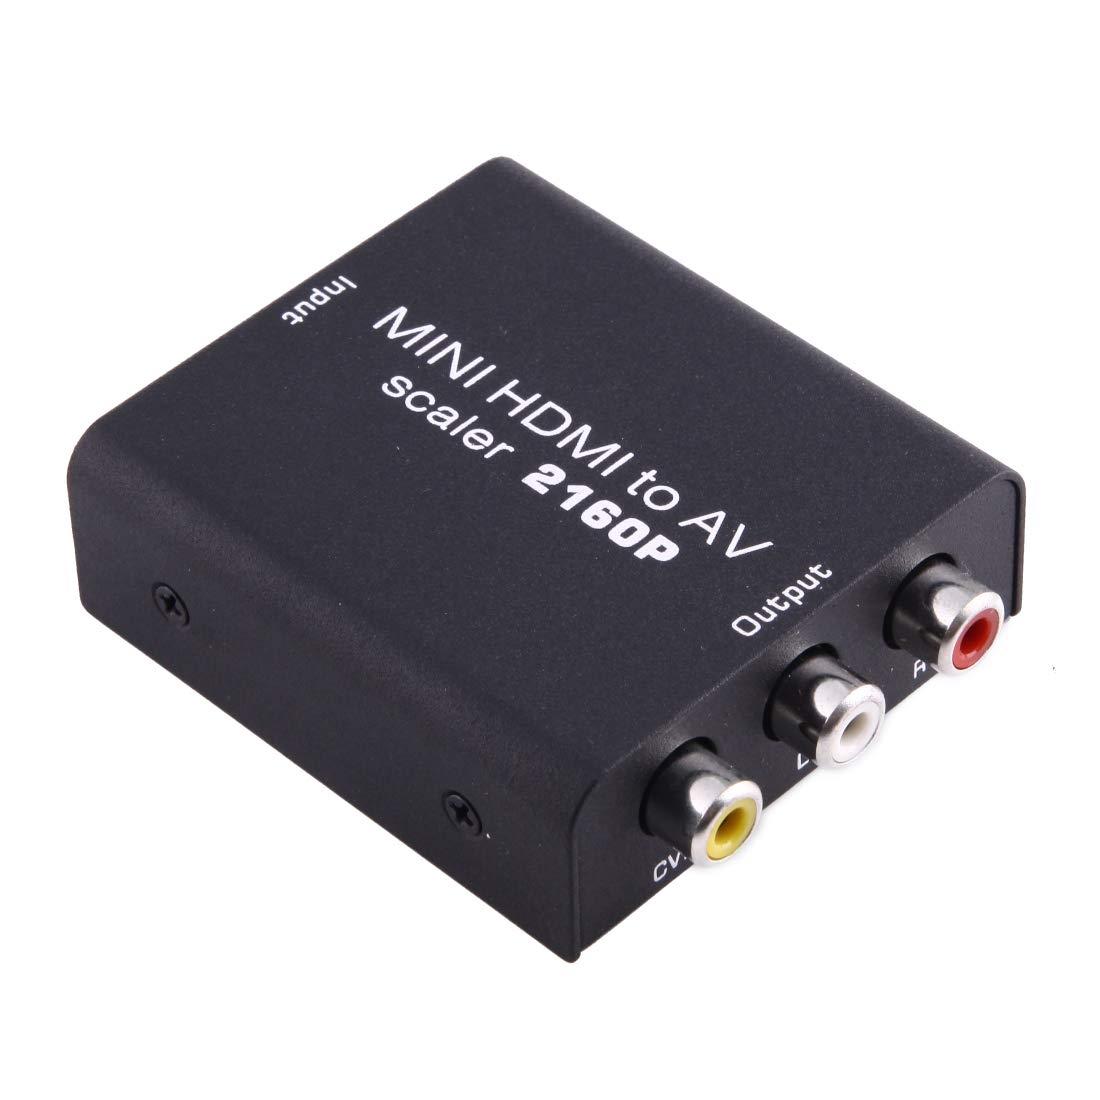 Anstoremate HDMI Series GuoBomate HDMI Series Mini HDMI to AV/CVBS Composite Video Signal Converter(Black) (Color : Black)